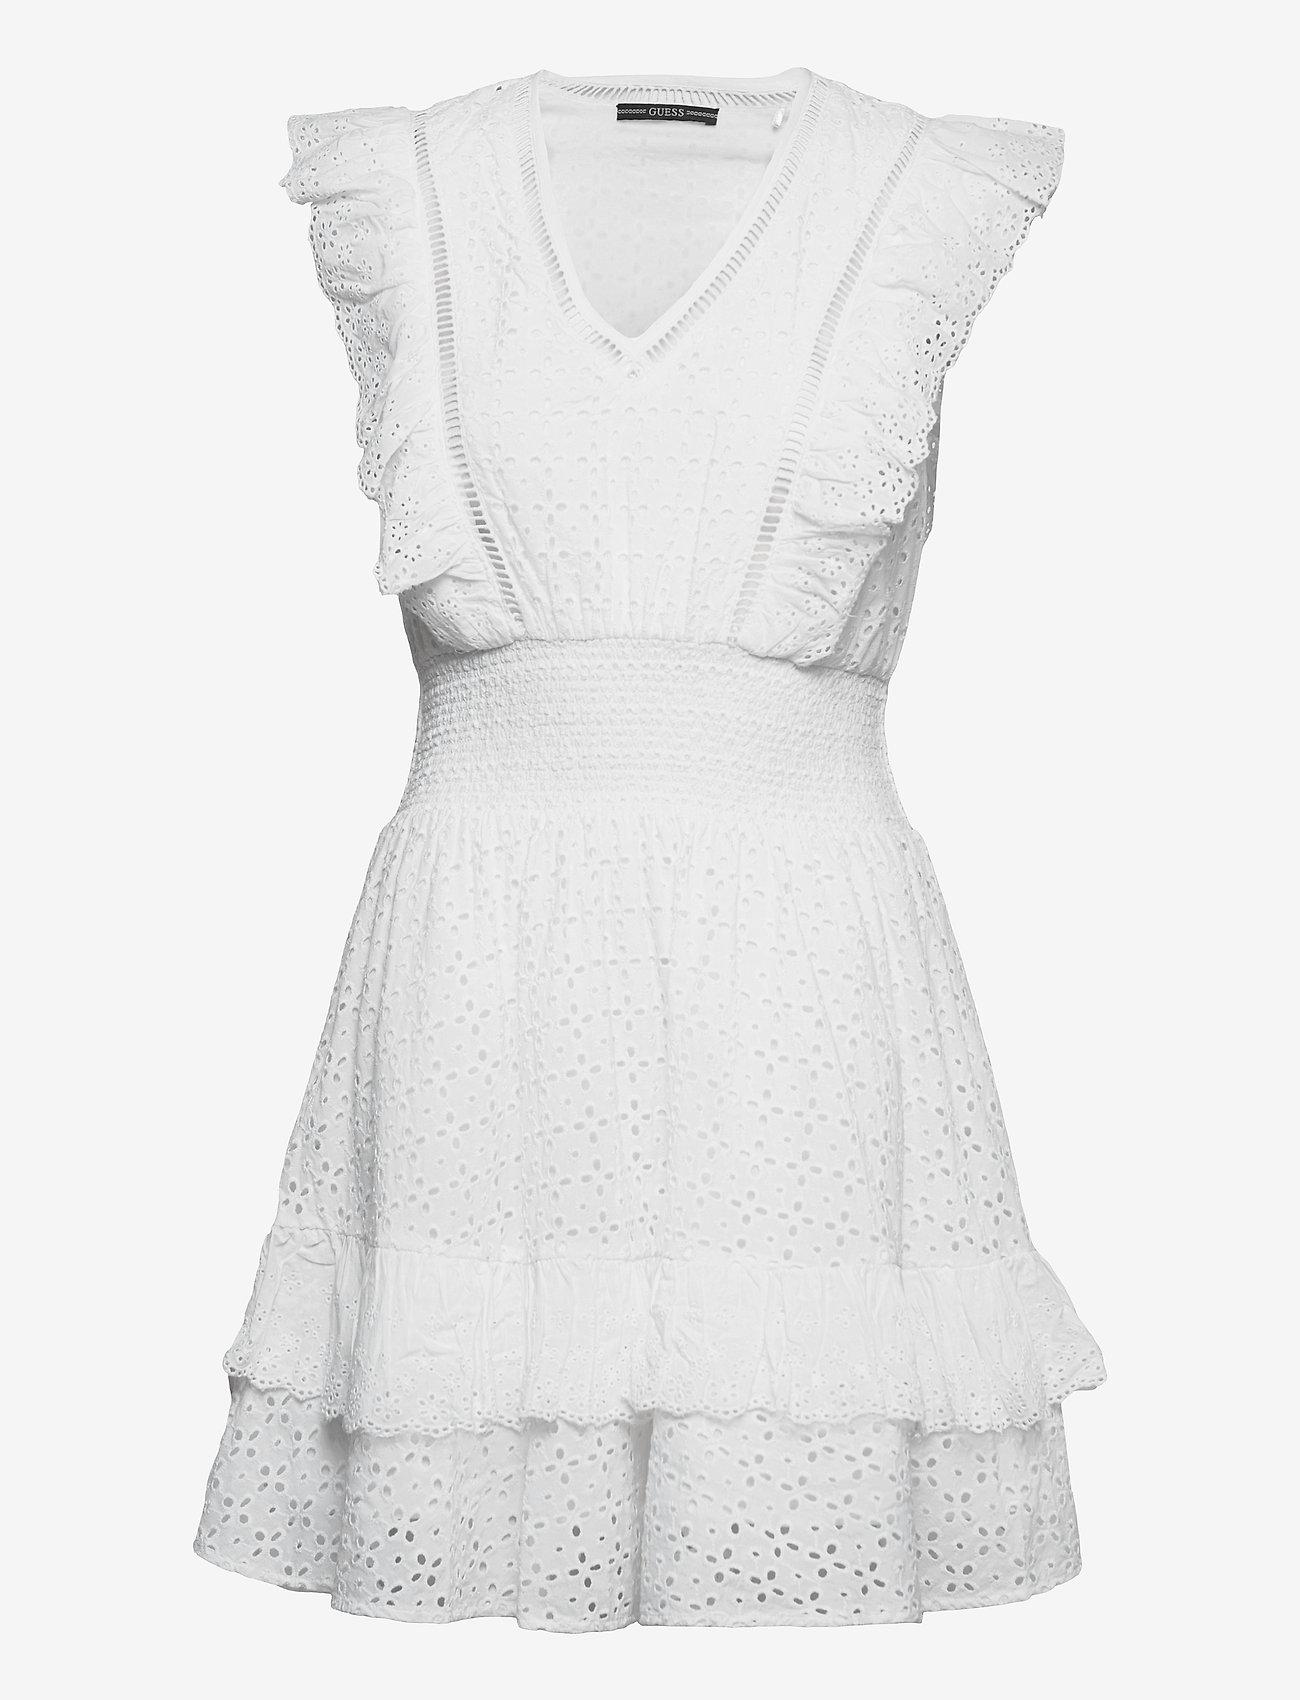 GUESS Jeans - AISHA DRESS - sommerkjoler - true white a000 - 0